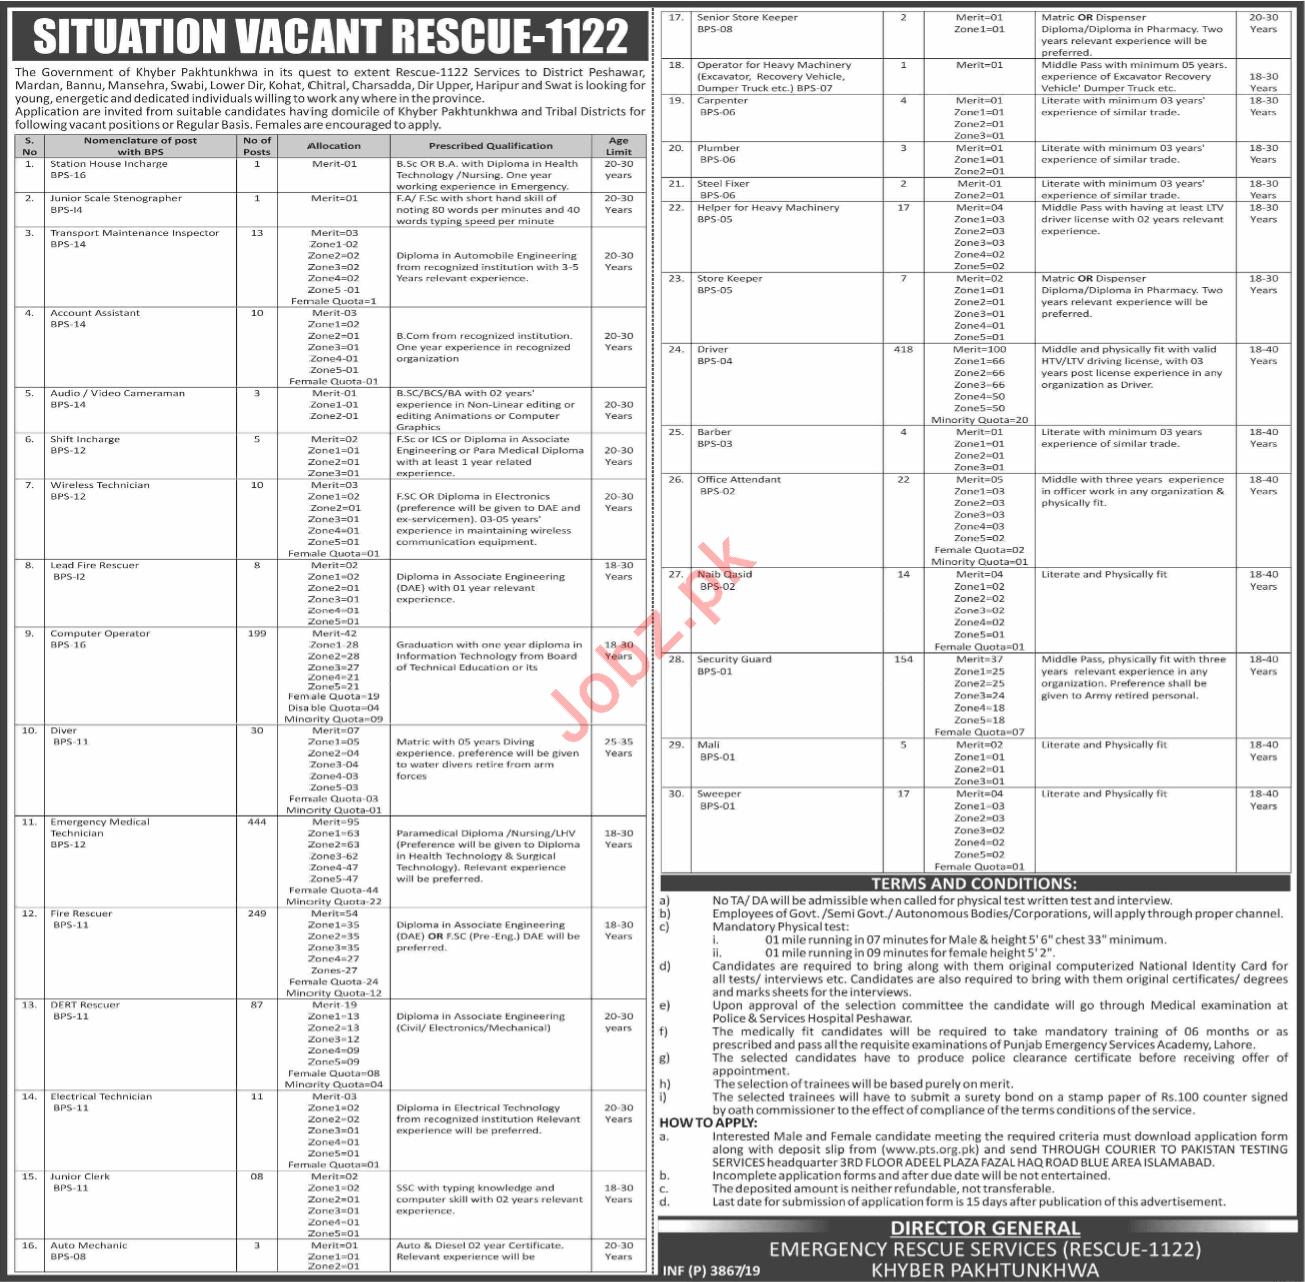 Rescue 1122 KPK Emergency Rescue Services Jobs via PTS